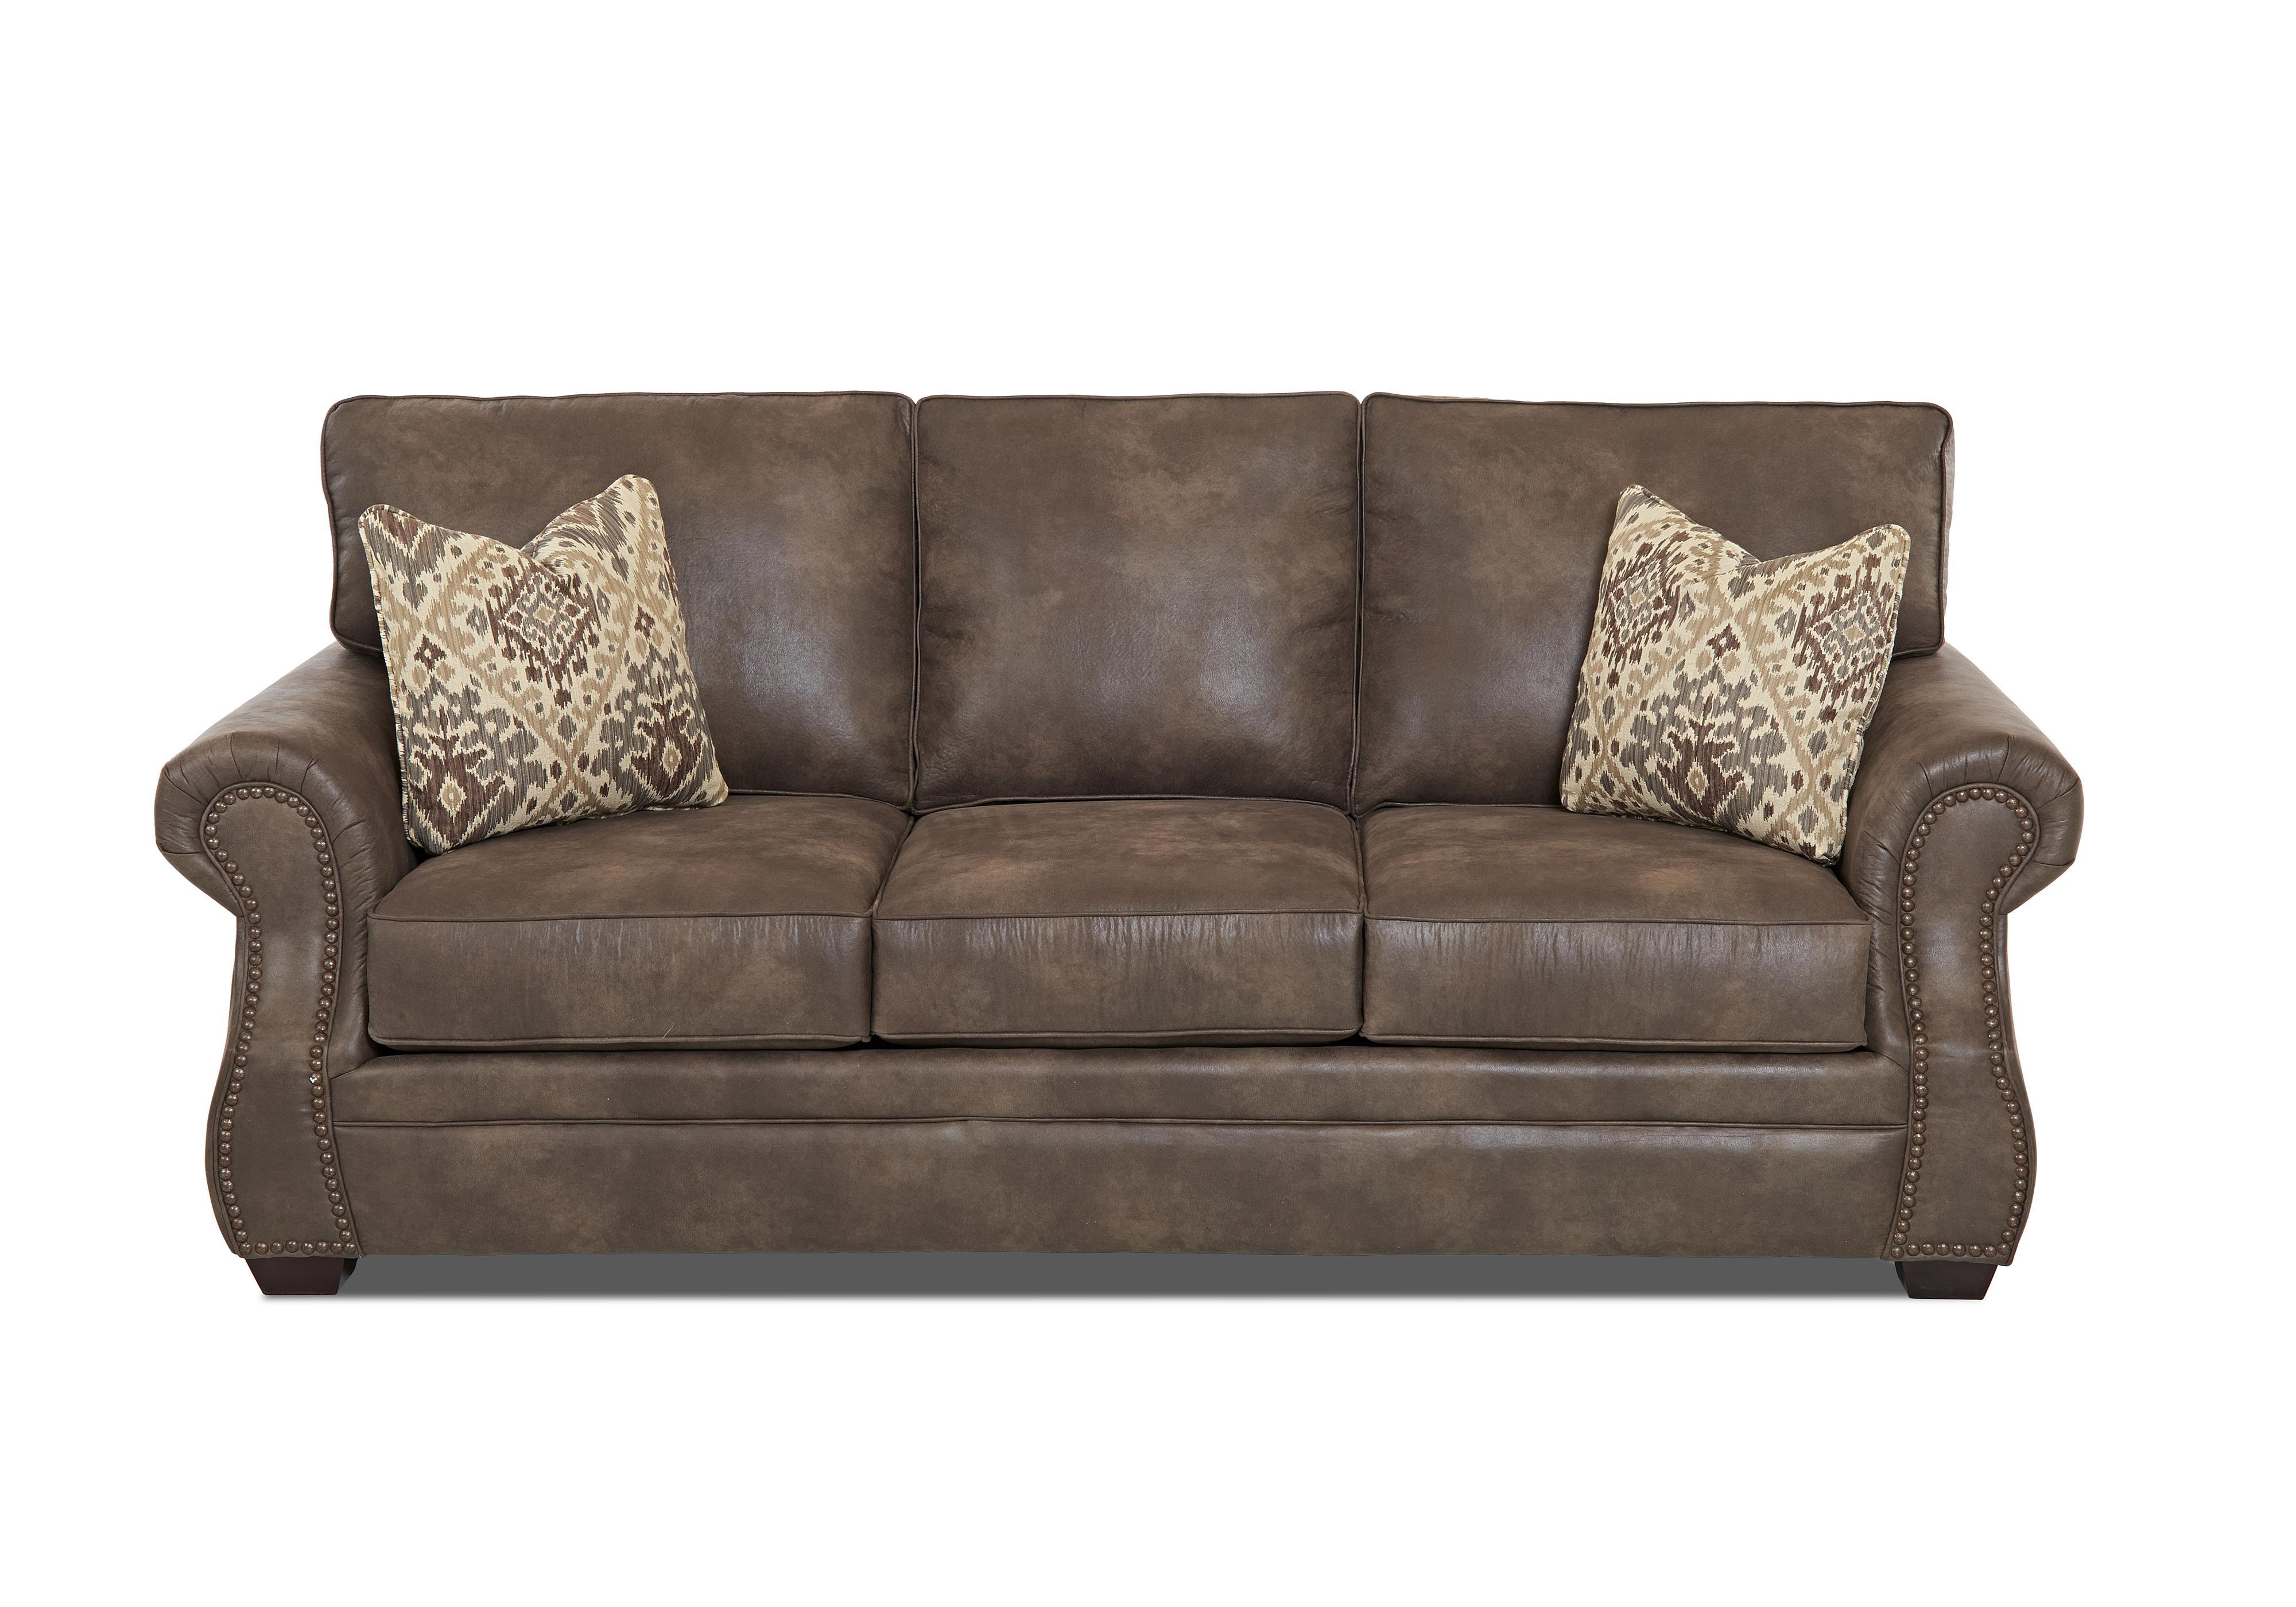 Traditional Dreamquest Queen Sleeper Sofa